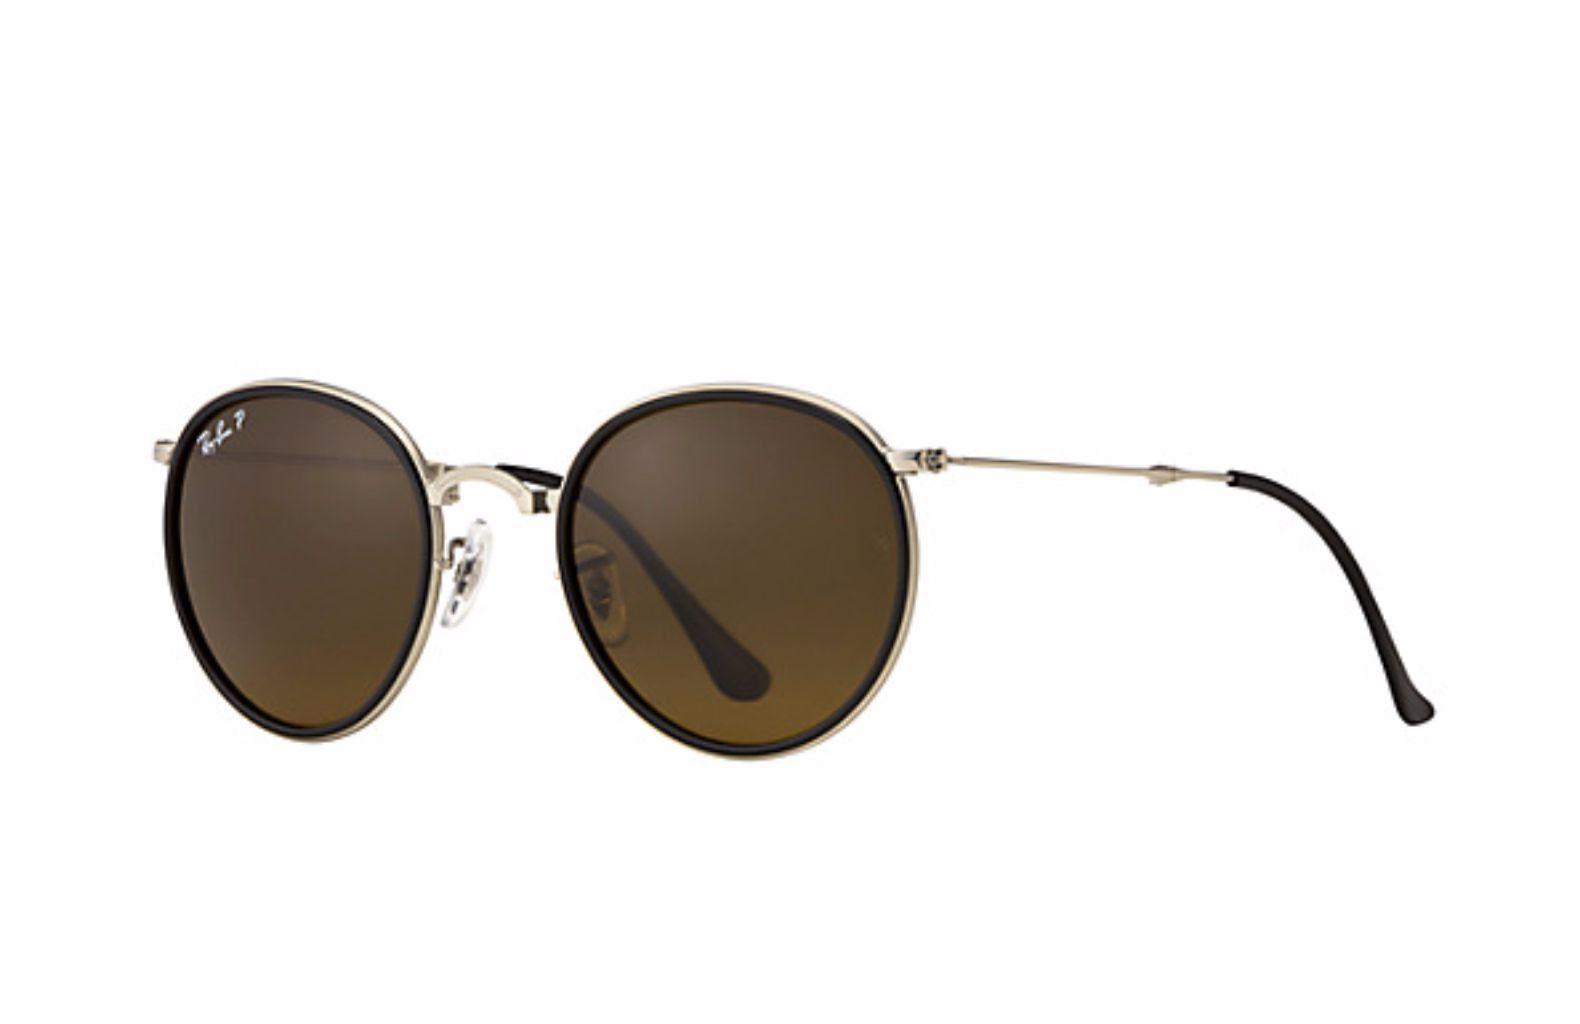 Ray Ban RB3517 019N6 48MM Sunglasses | Round ray bans